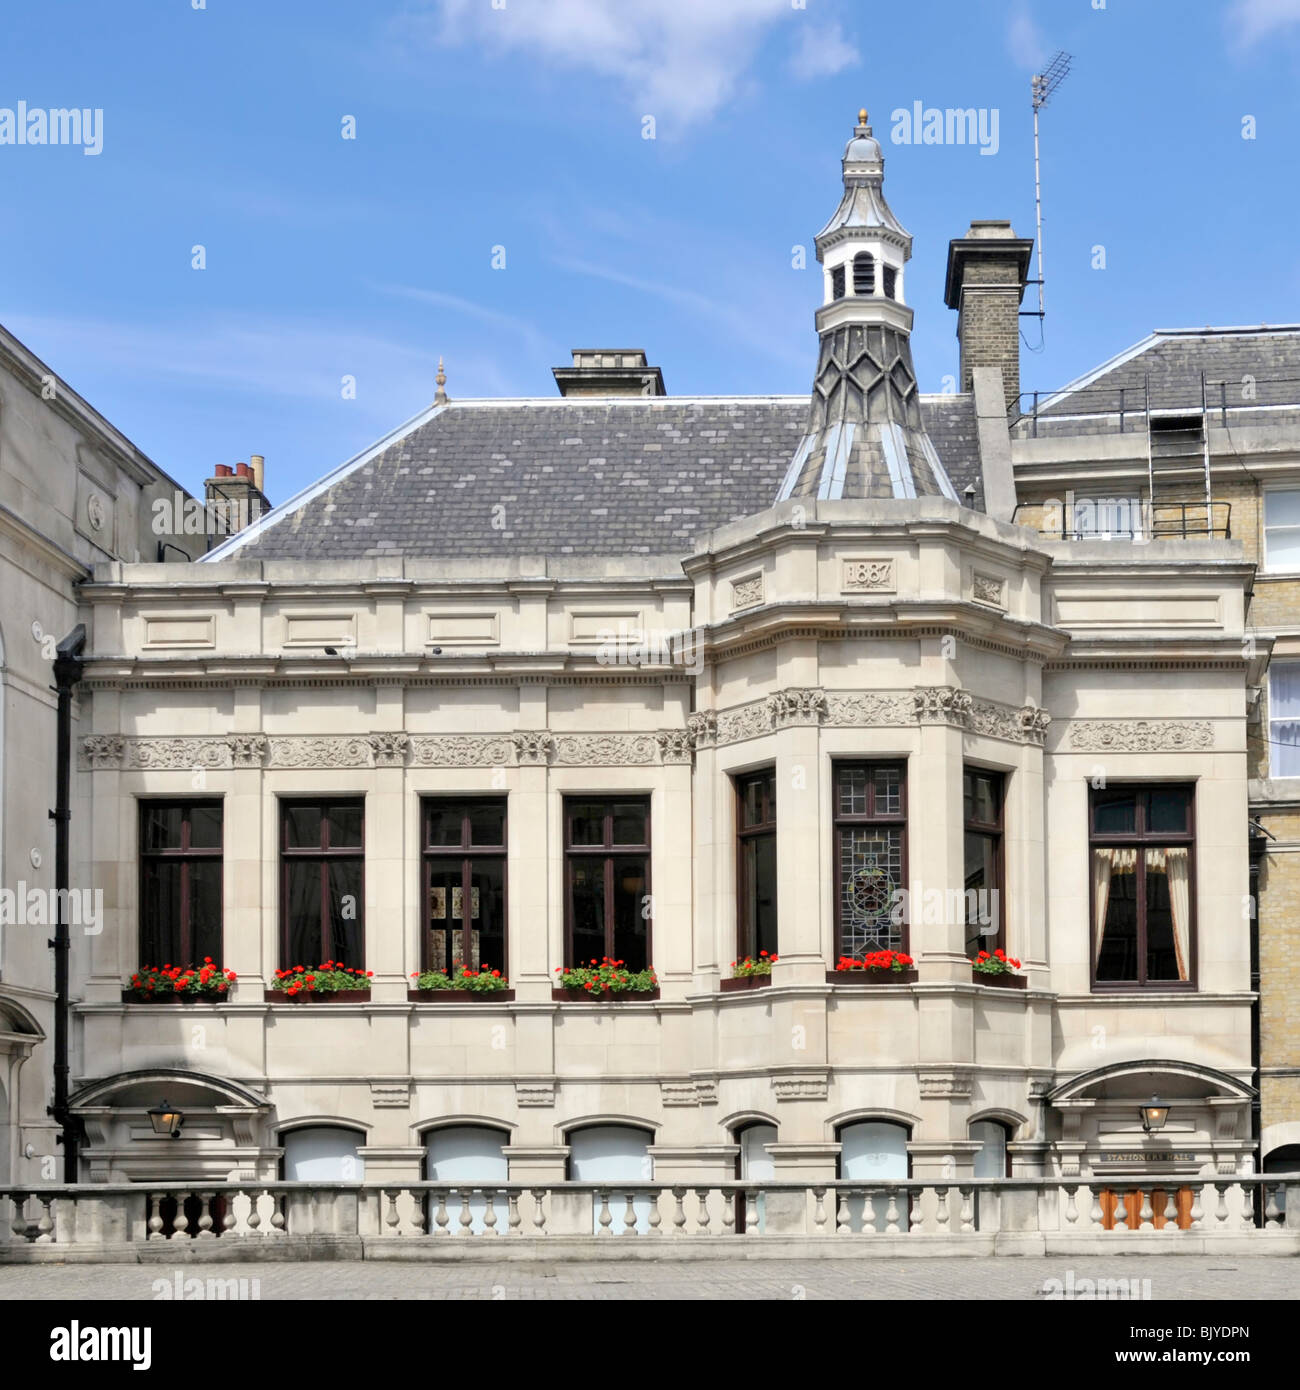 Stationers Hall London - Stock Image